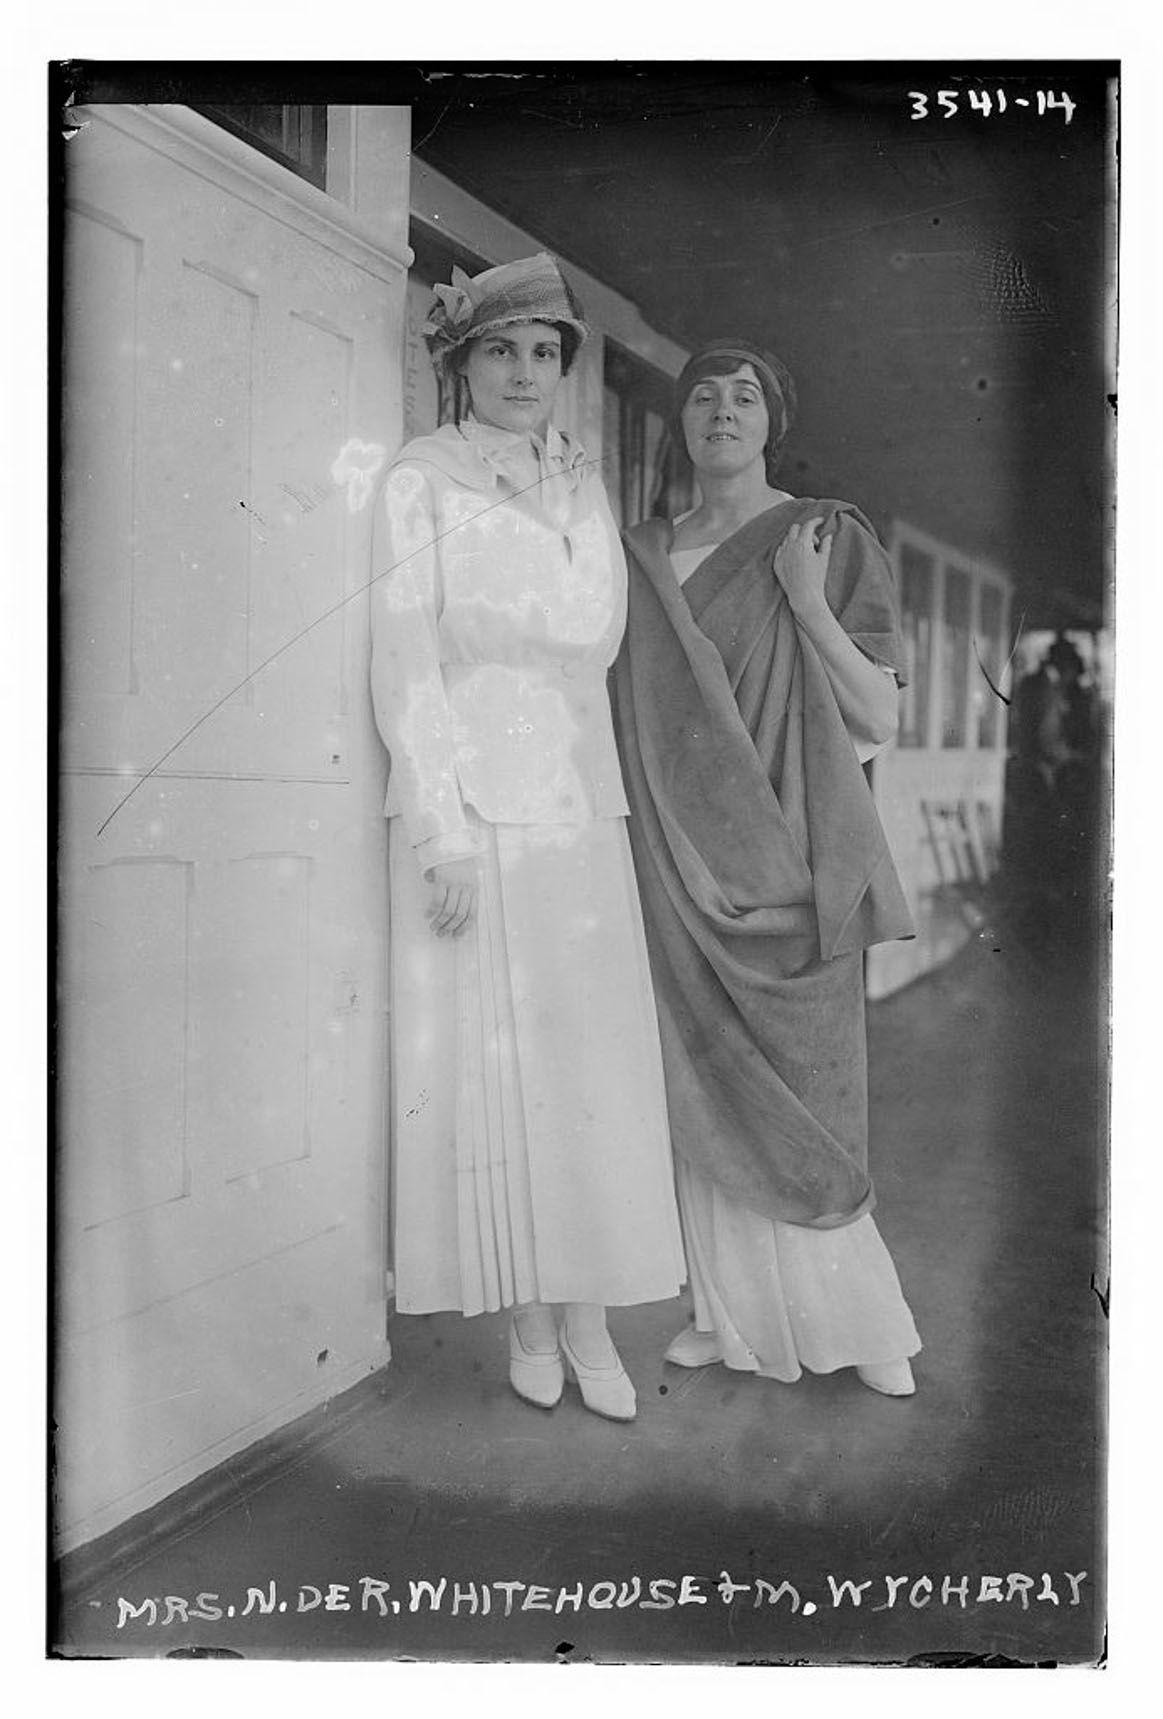 Mrs. N. Der. Whitehouse